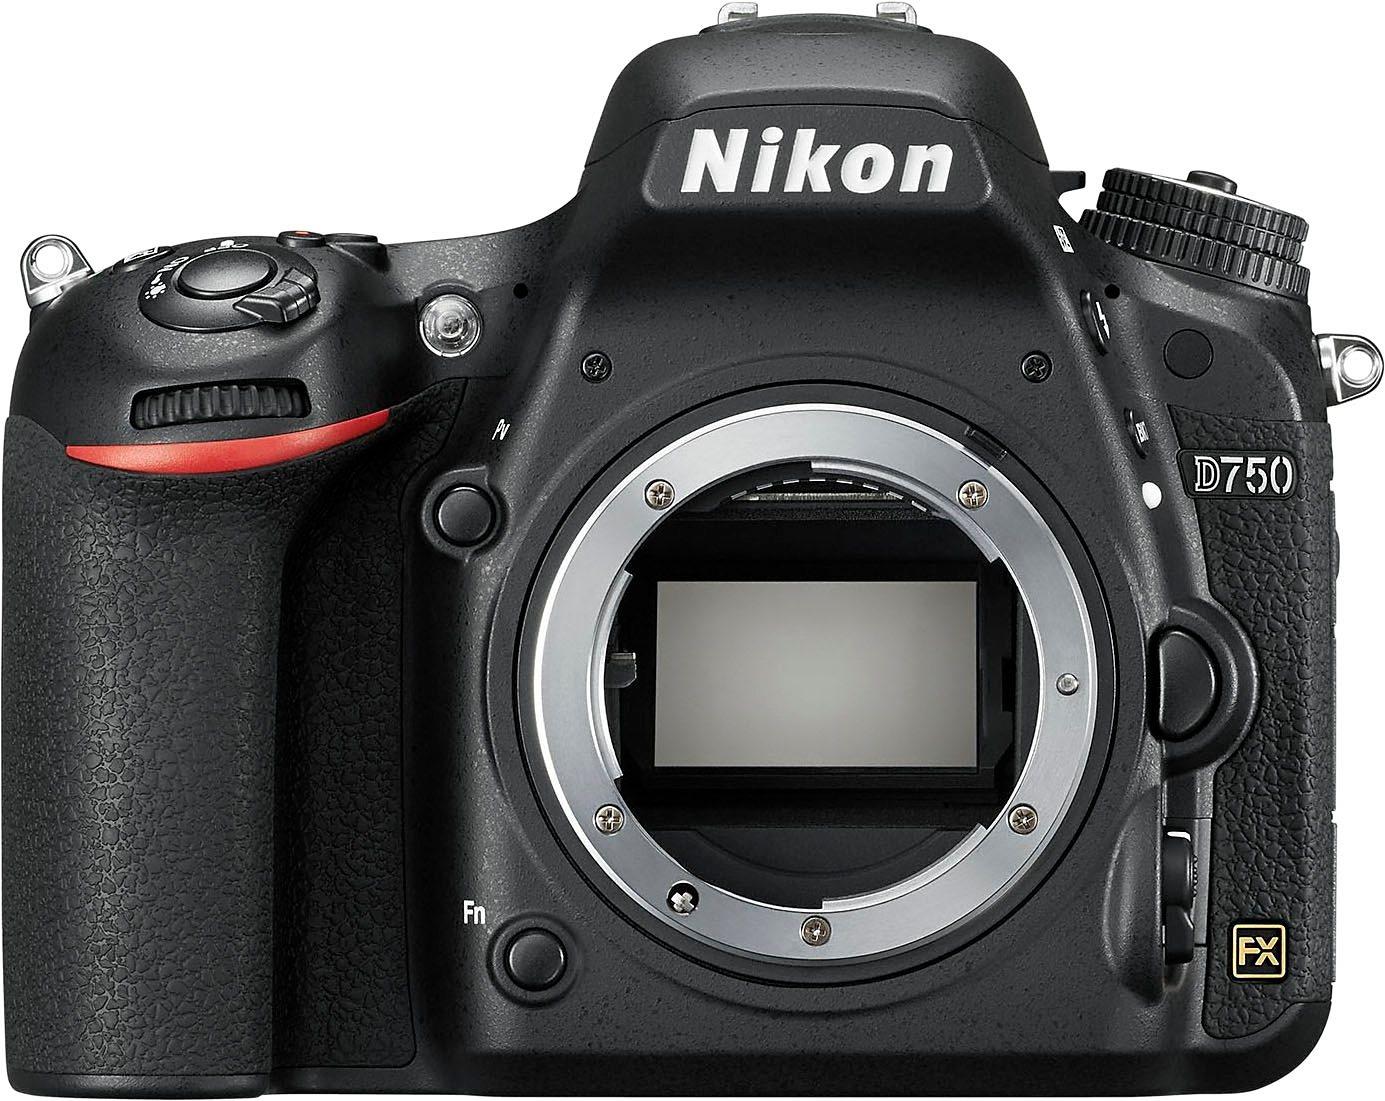 Nikon D750 Spiegelreflex Kamera, 24,3 Megapixel...